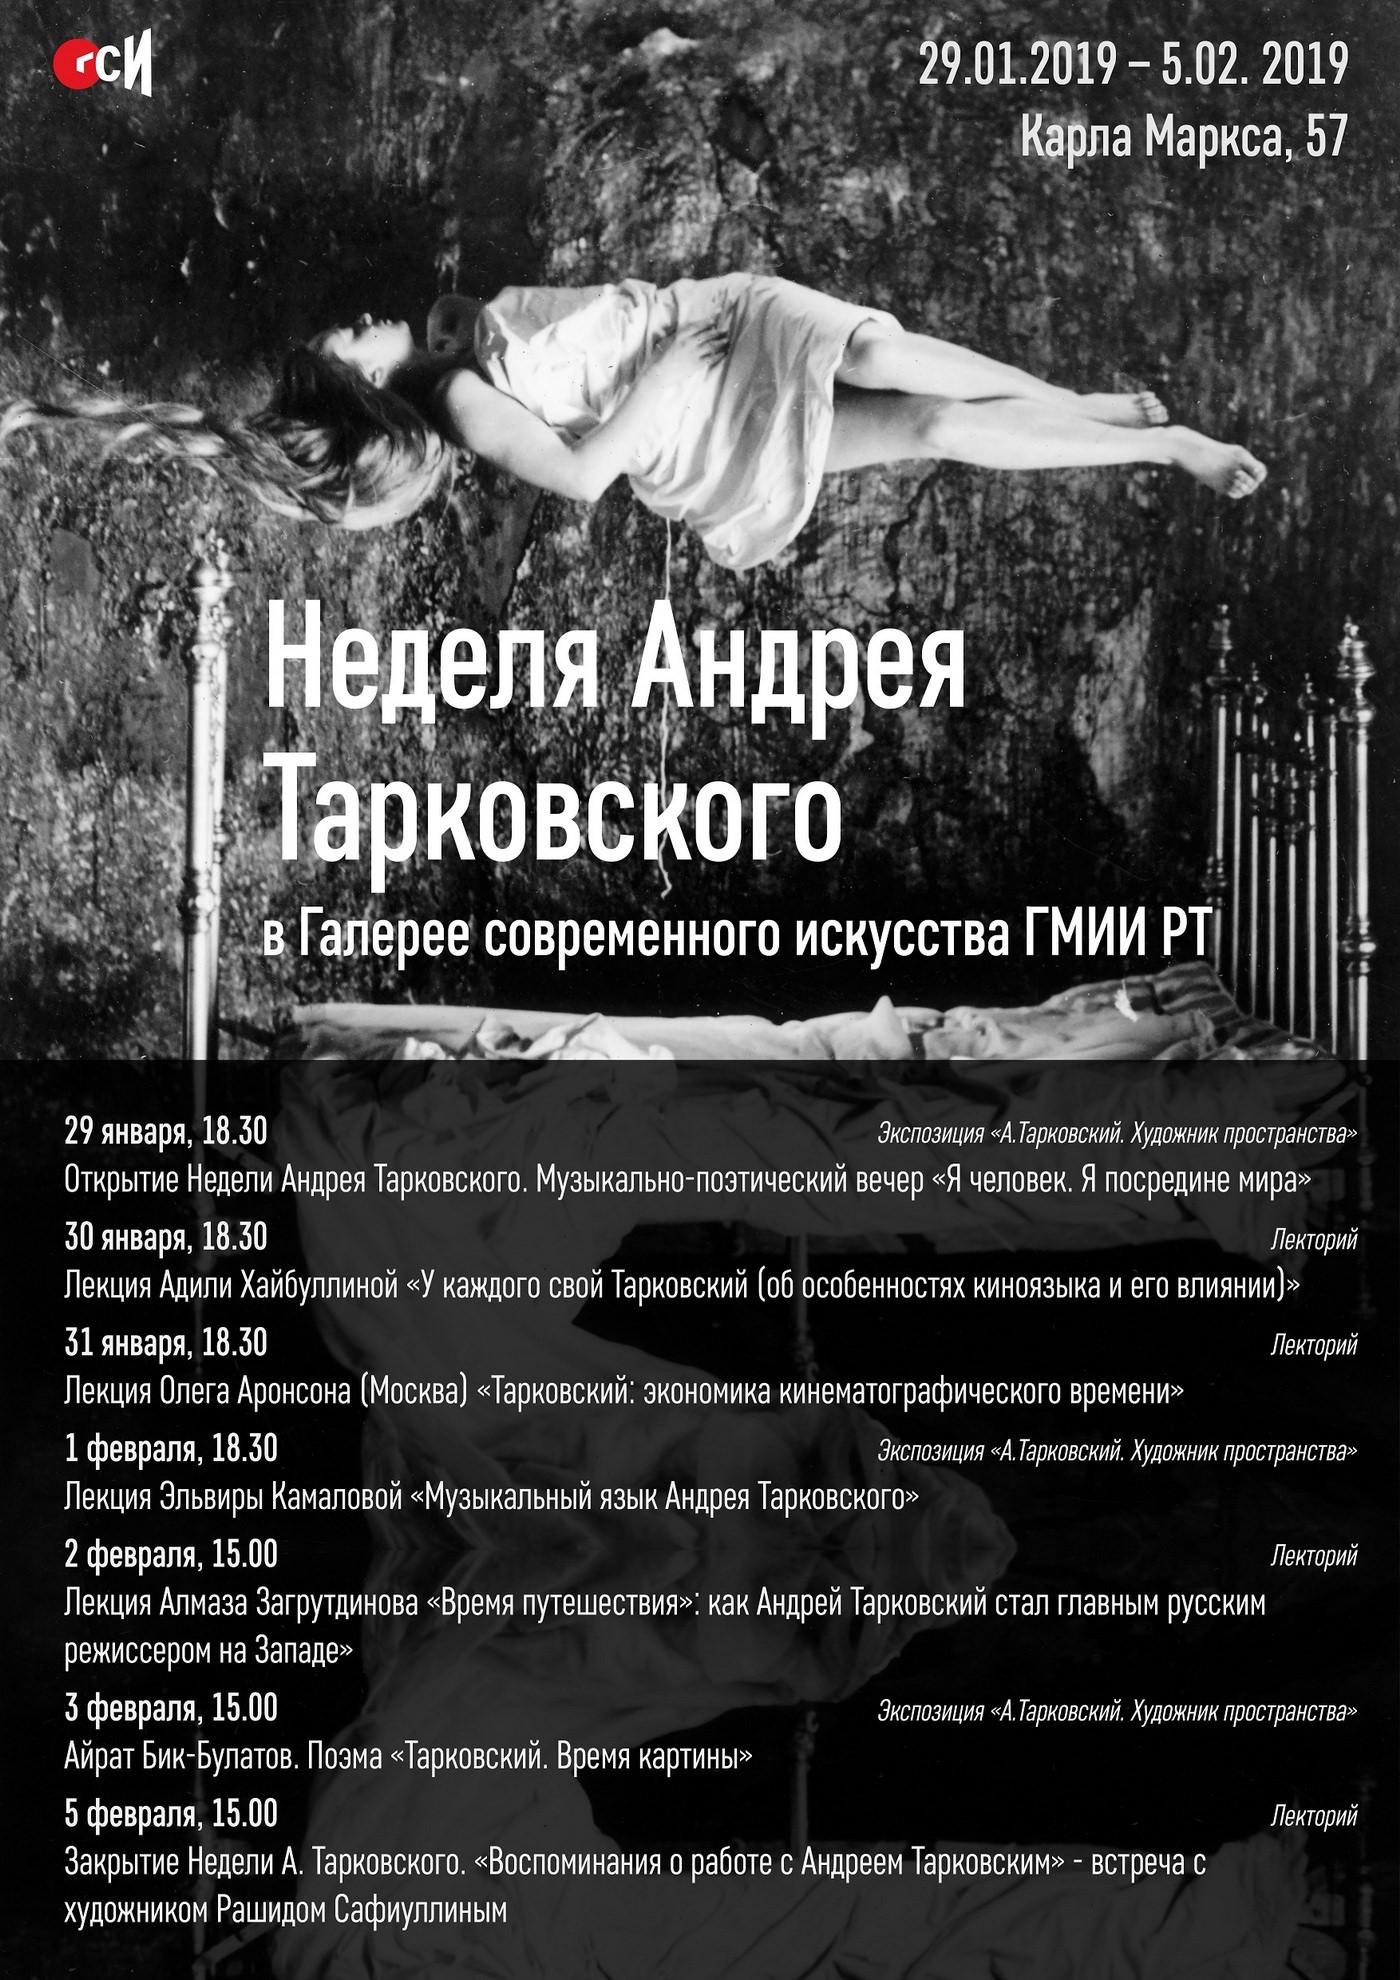 Andrei Tarkovsky Week